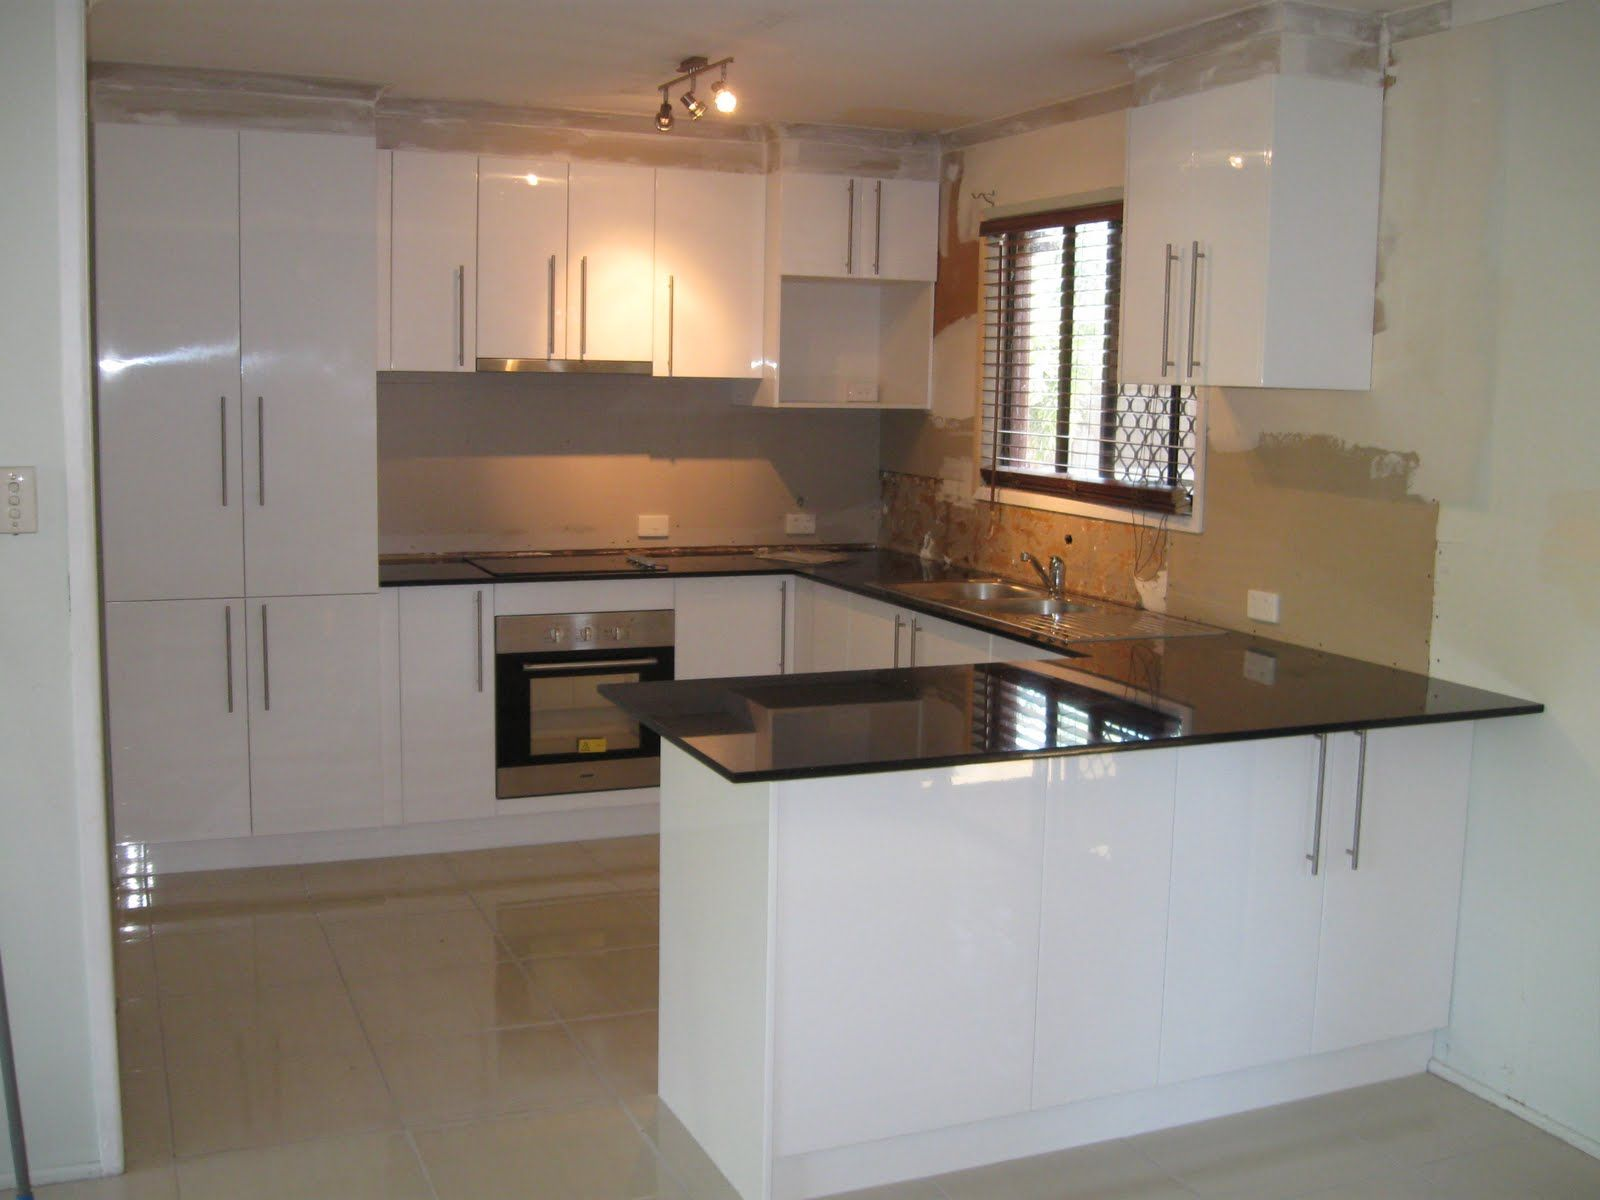 Add Value Kitchens U Shape Kitchen From Add Value Kitchens